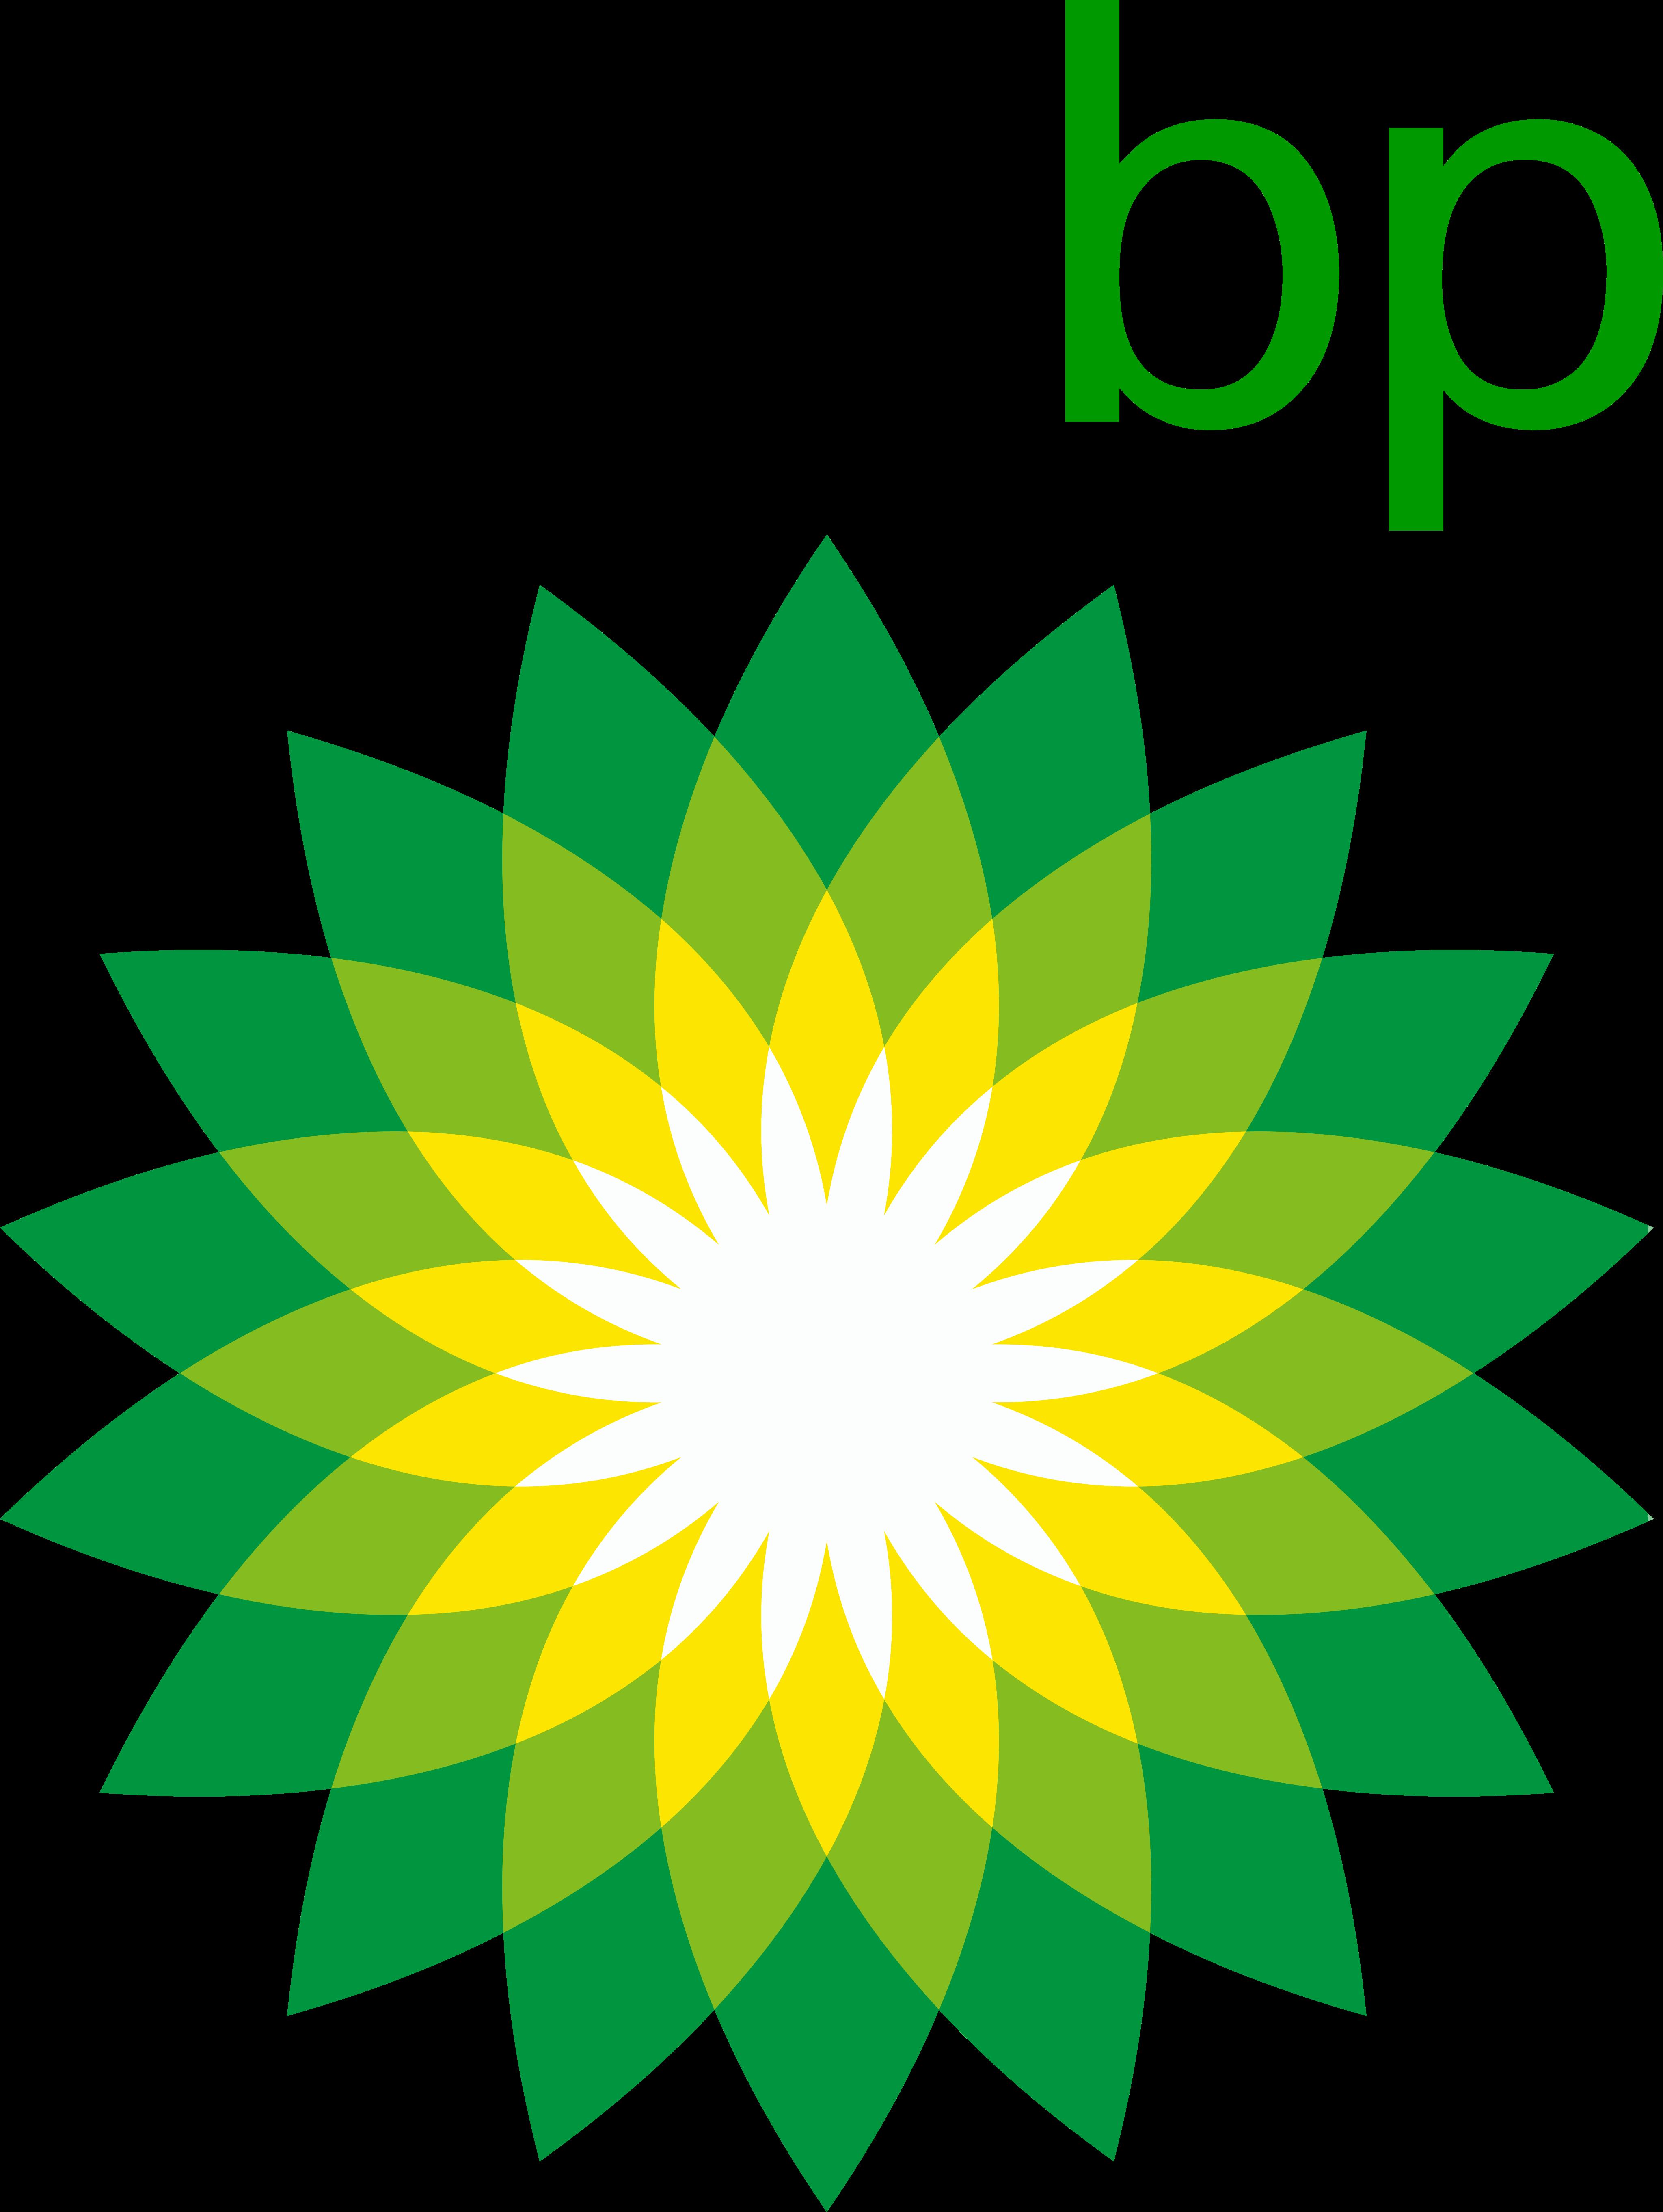 bp logo 1 - BP Logo